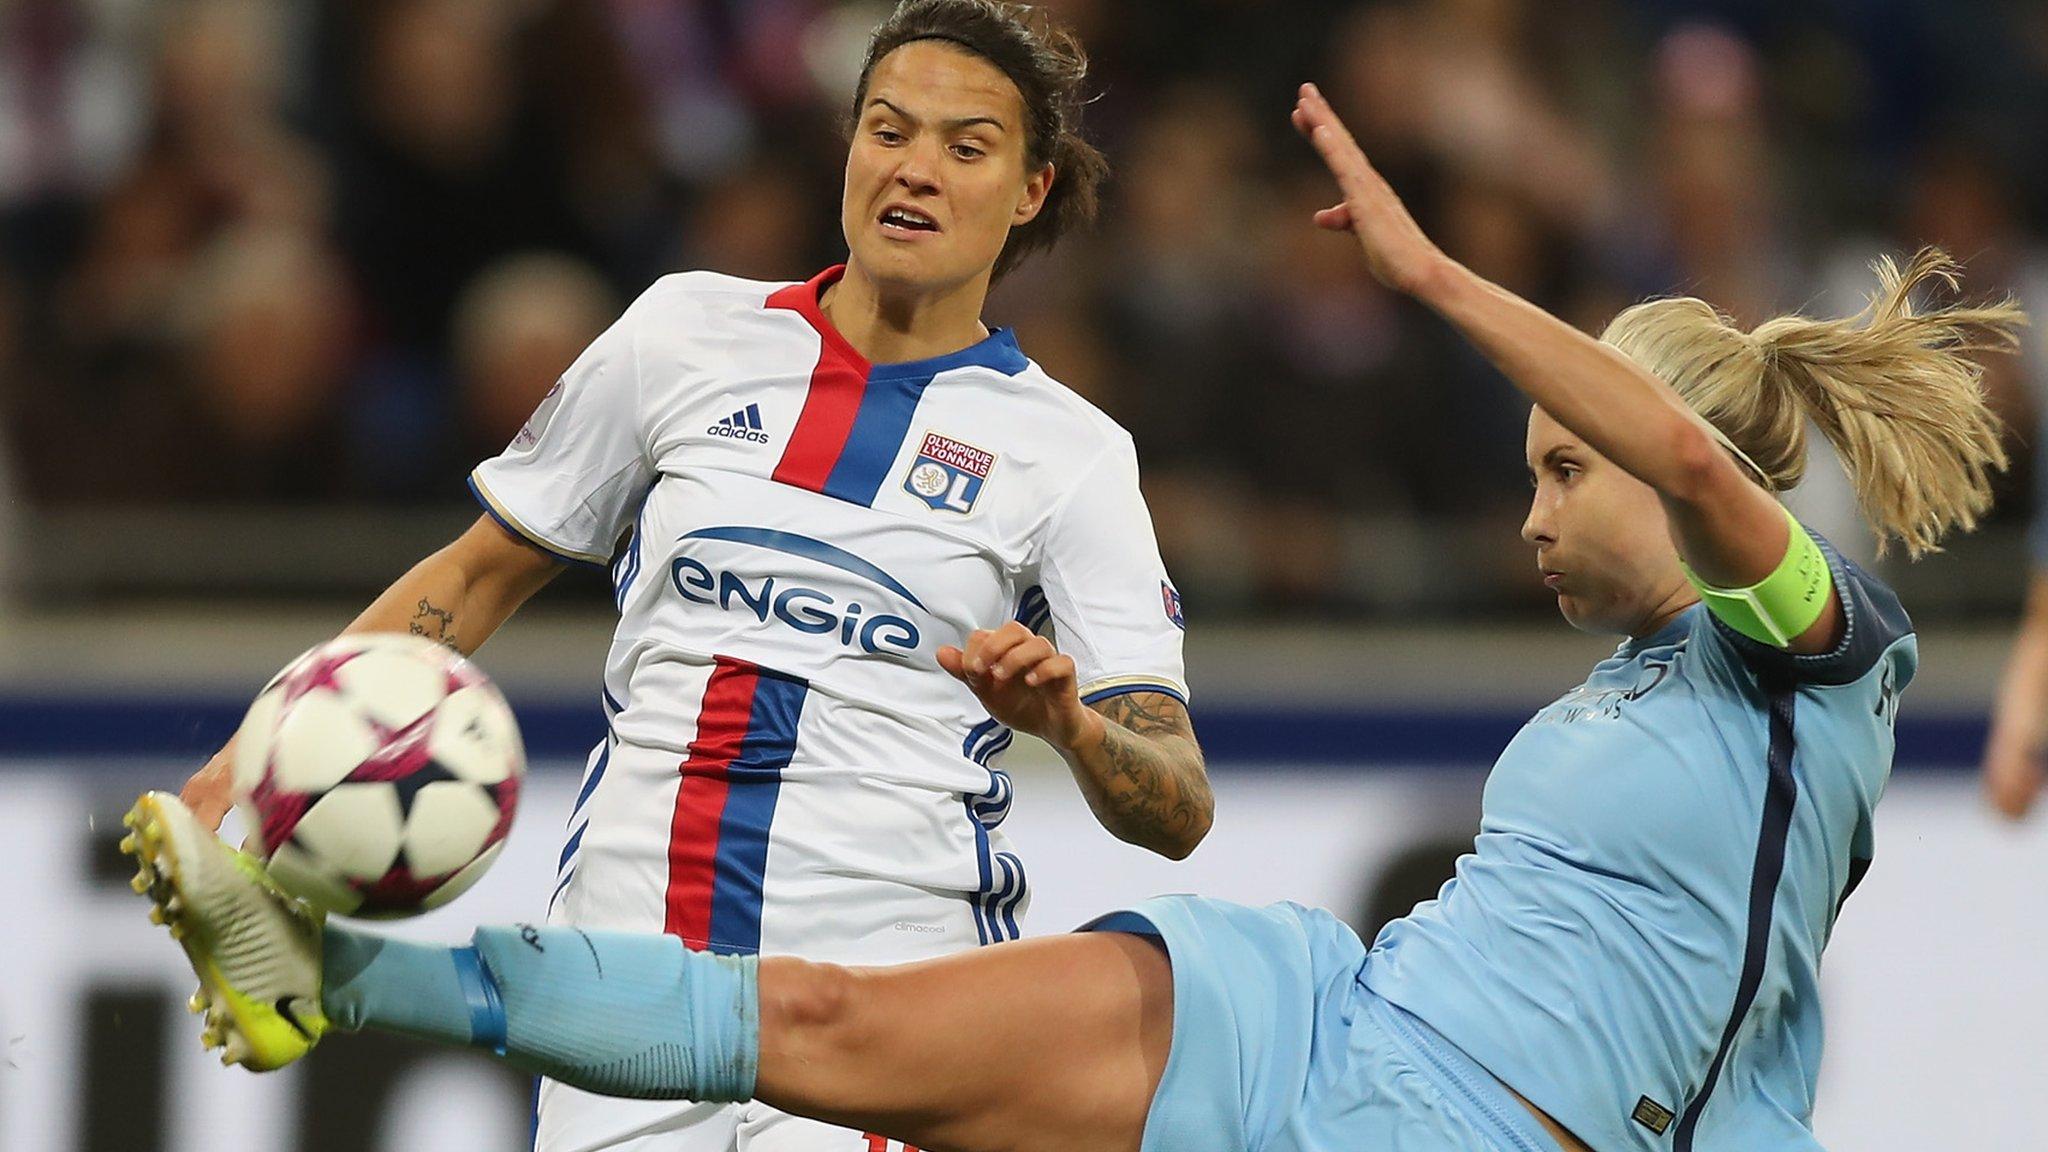 Man City exit Women's Champions League despite win in Lyon